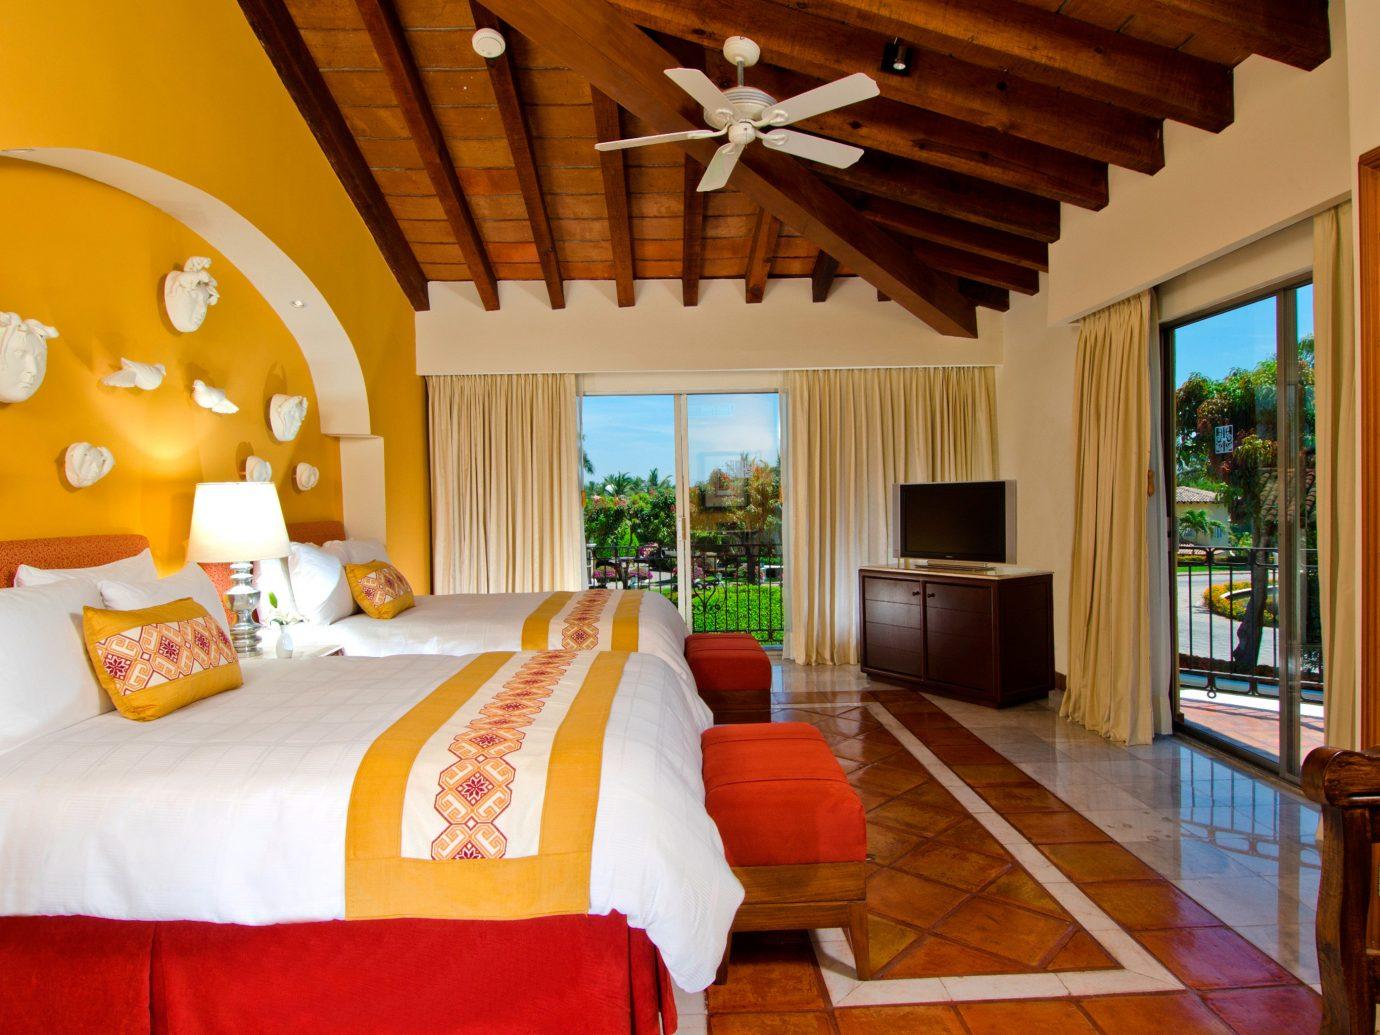 All-Inclusive Resorts Bedroom Hotels Patio Scenic views Suite indoor floor wall room property Resort estate cottage Villa home living room real estate interior design farmhouse furniture